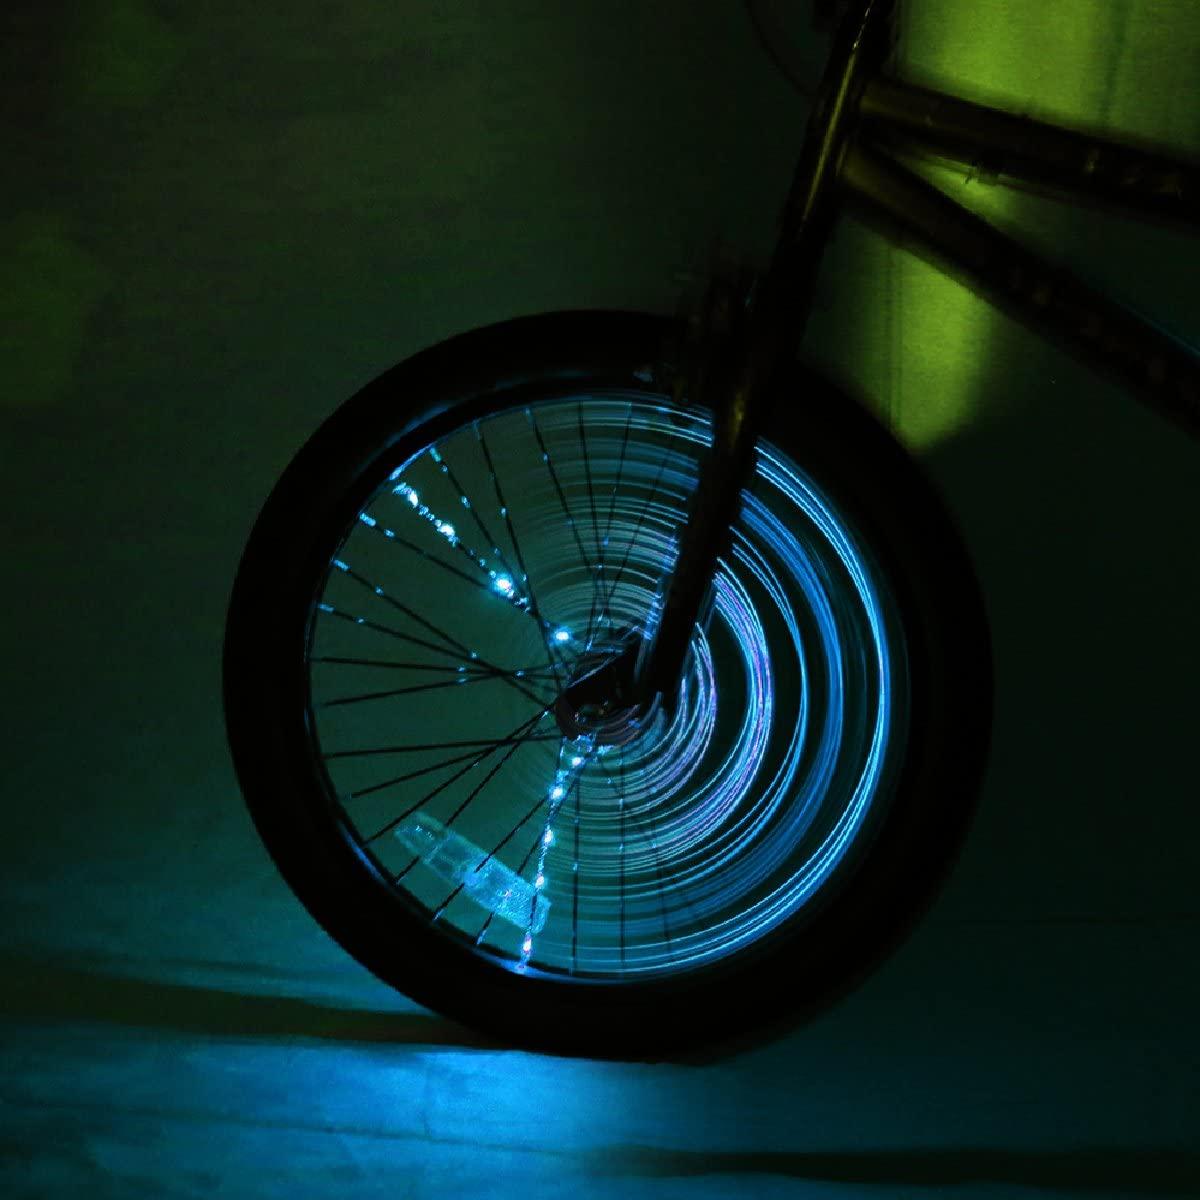 Brightz SpokeBrightz LED Bicycle Spoke Accessory Light (for 1 Wheel), Blue